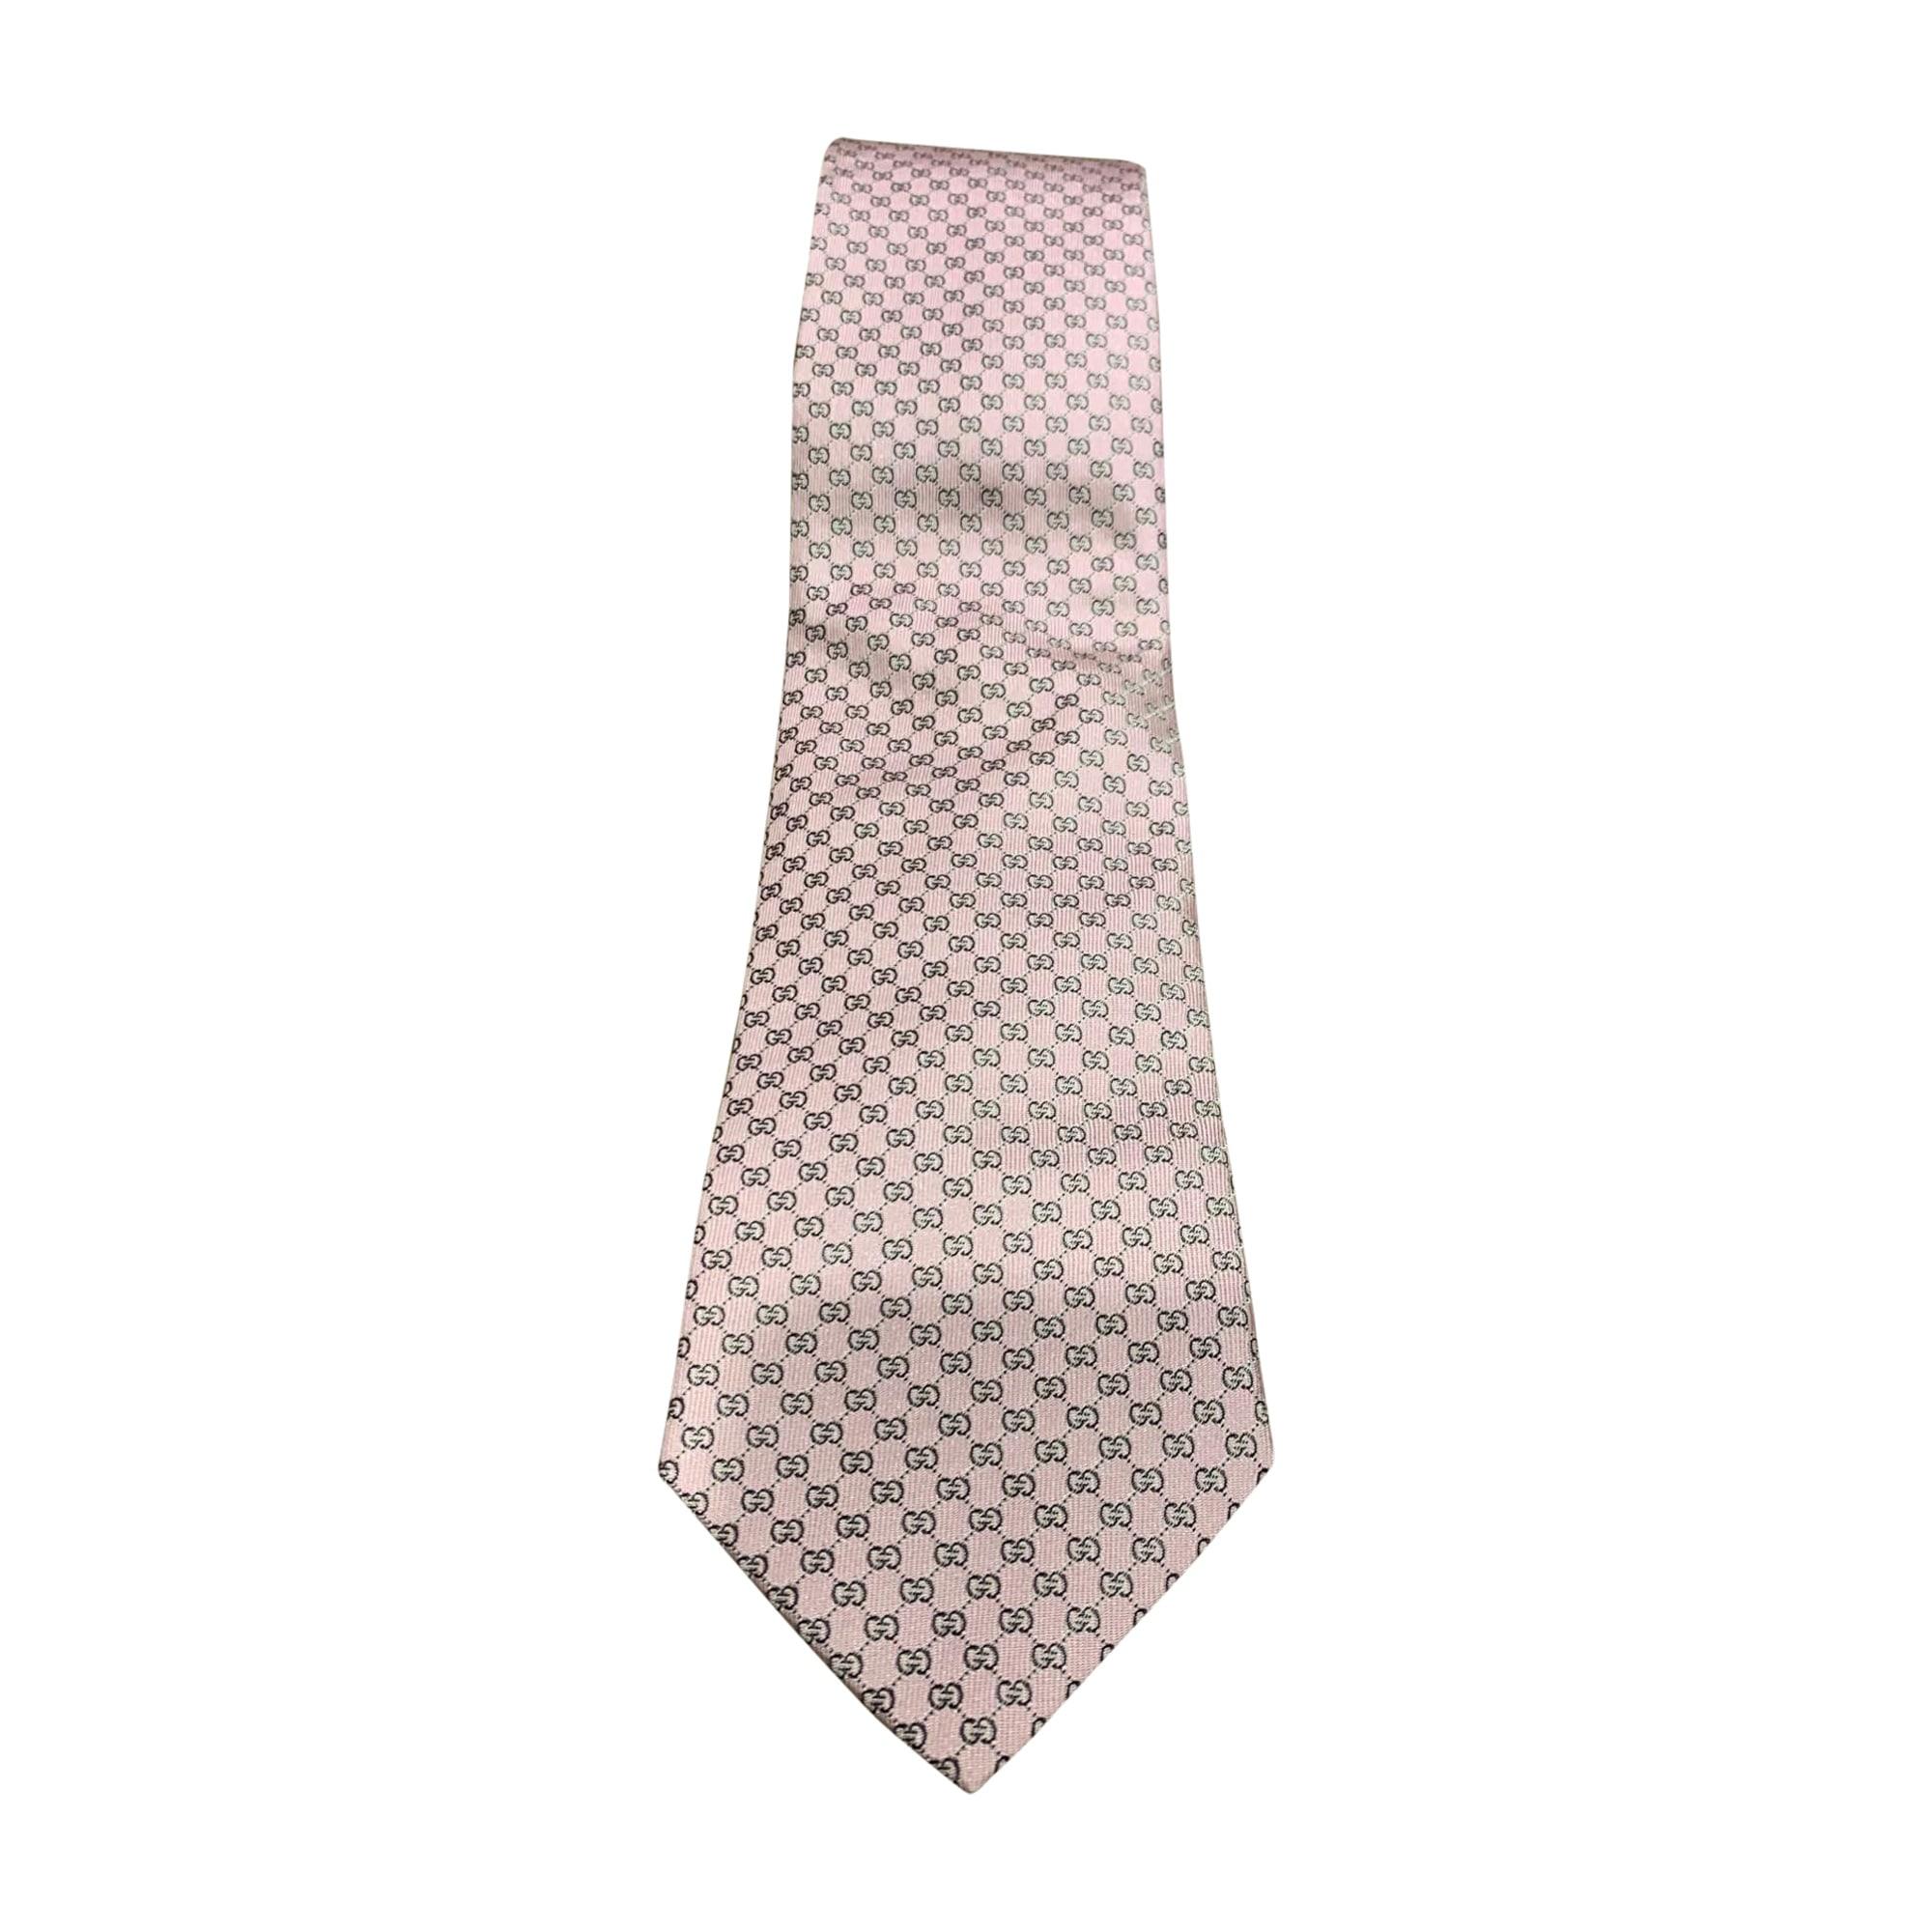 Tie GUCCI Pink, fuchsia, light pink